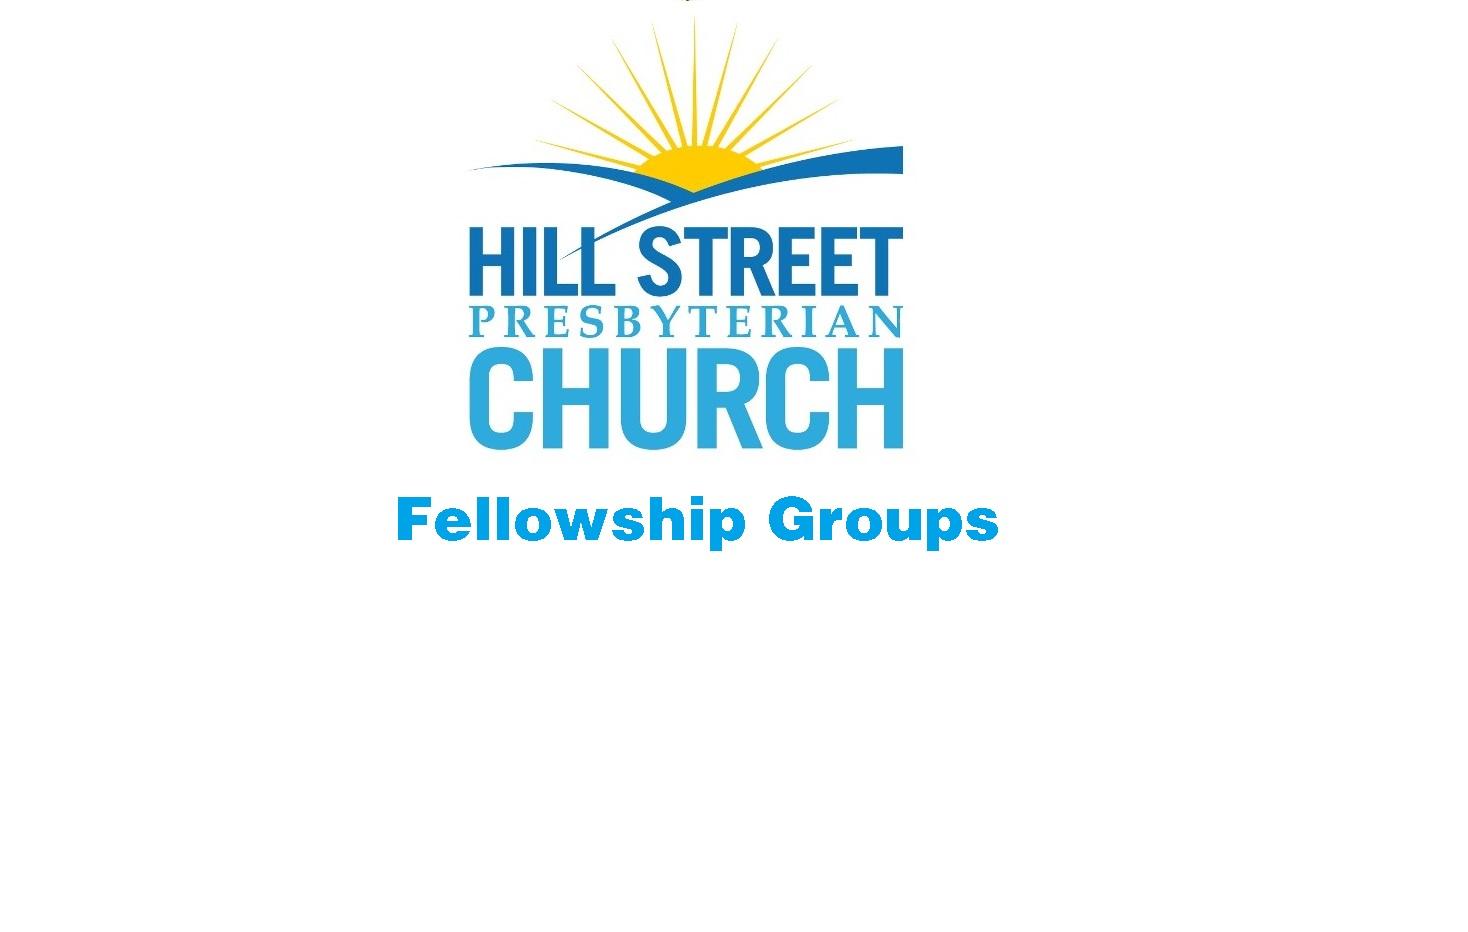 Home Fellowship Groups logo (2011).jpg